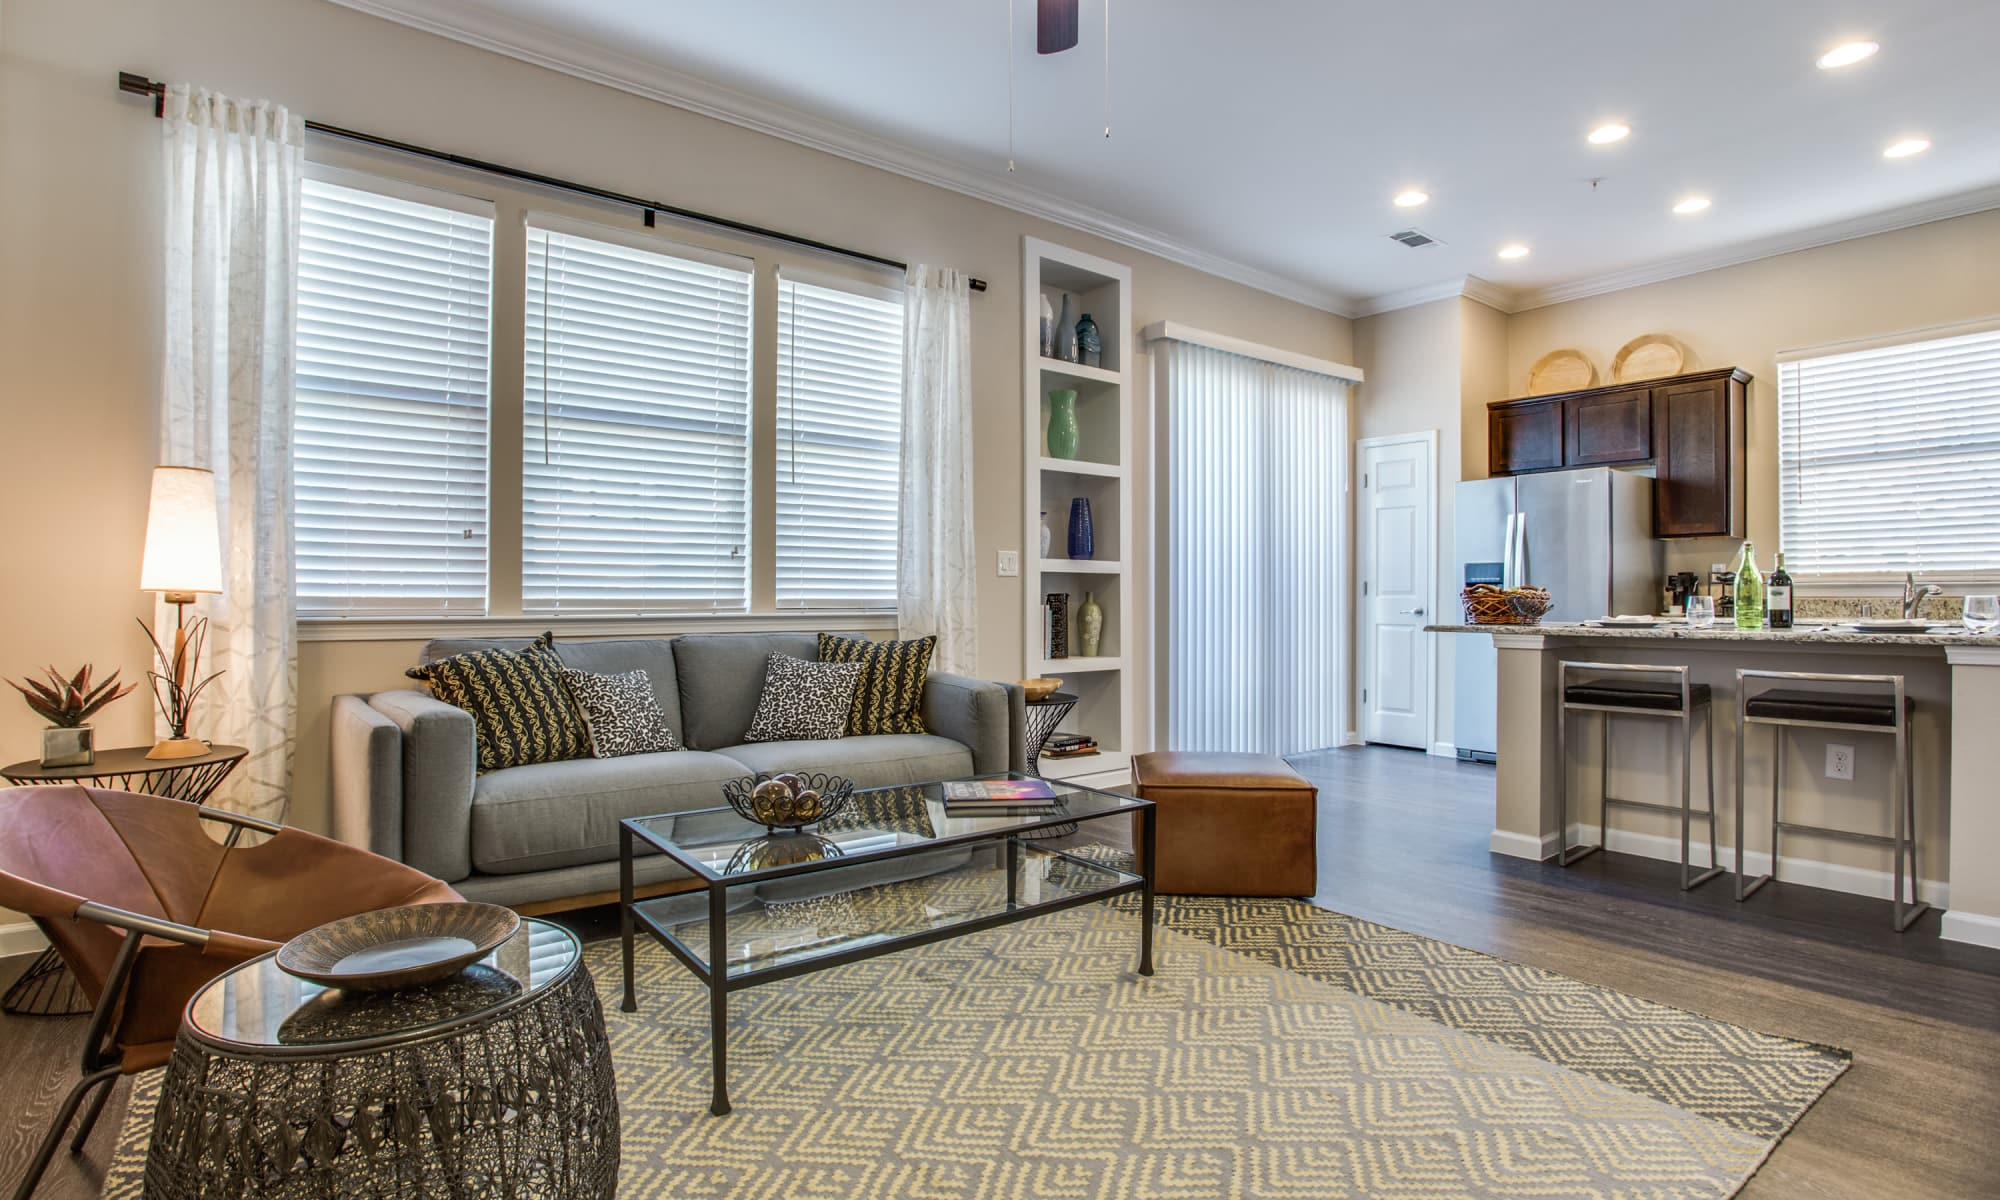 Central Plano, TX Apartment Homes for Rent near Allen | Avilla Premier